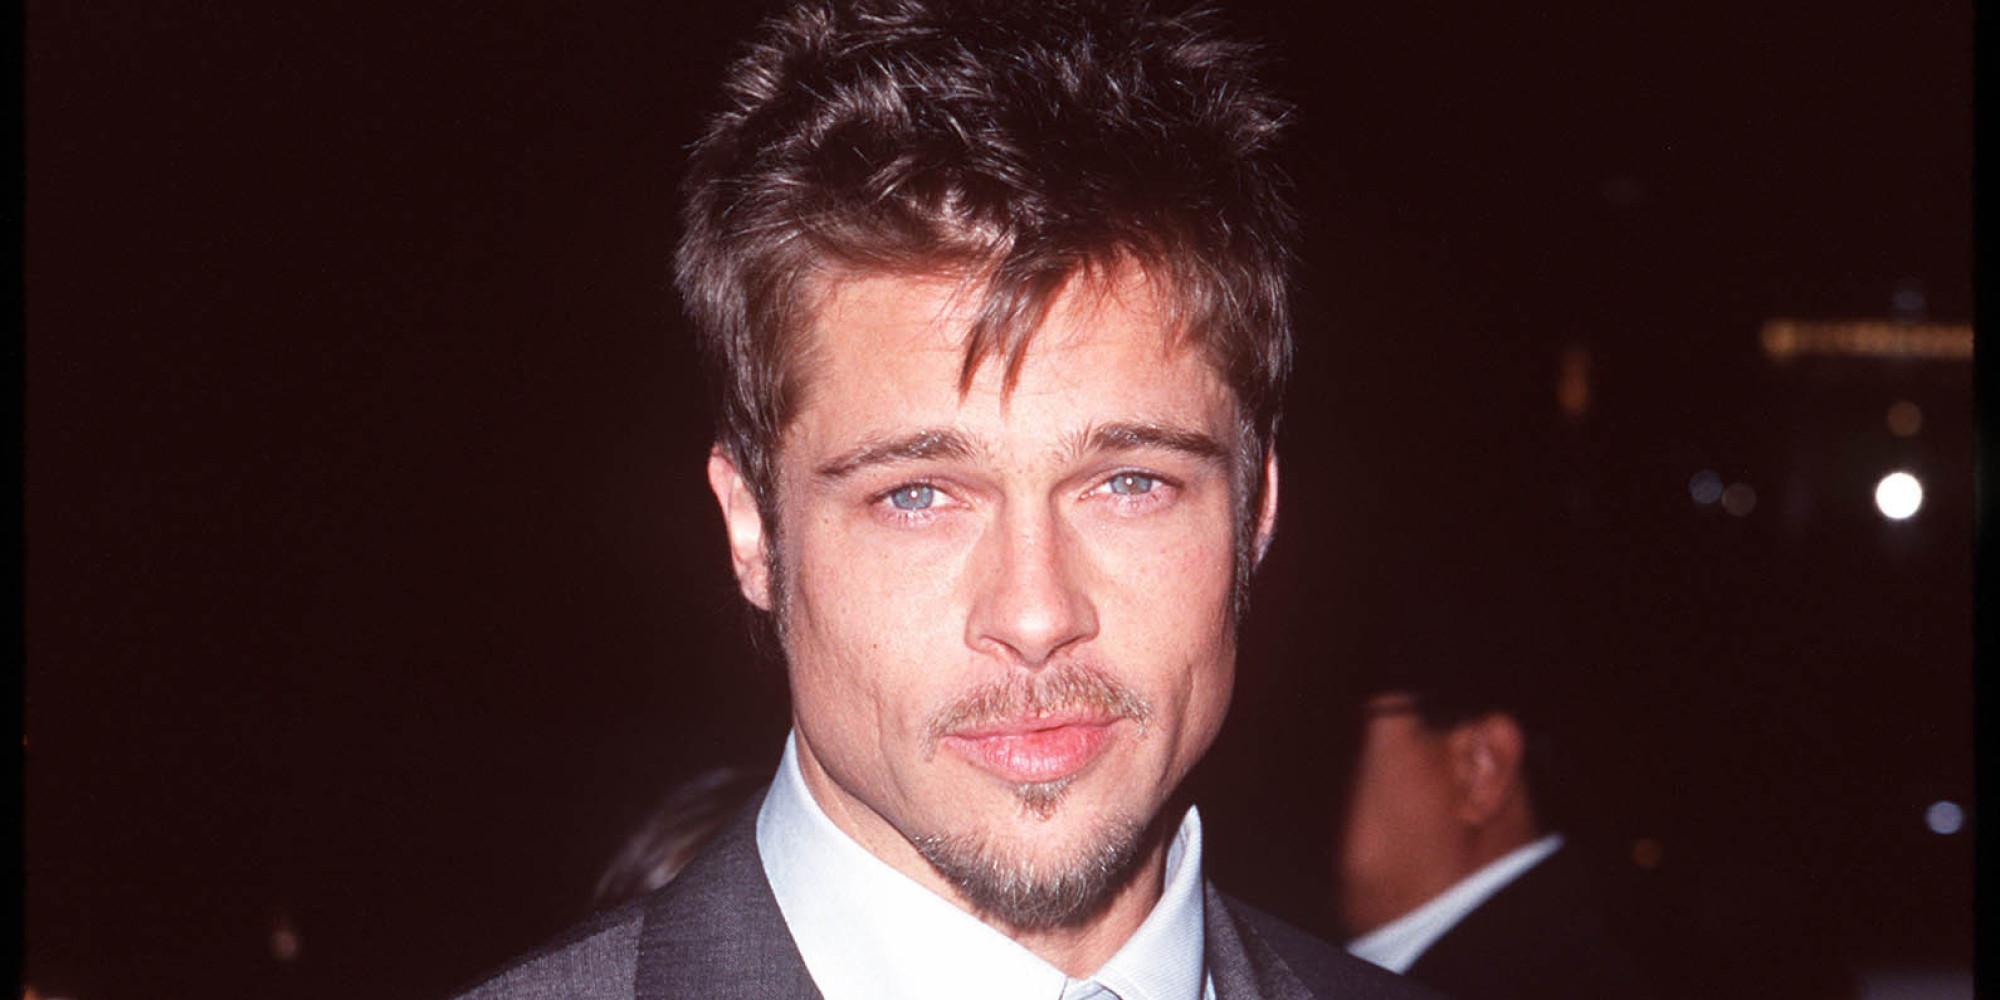 Brad Pitt's Hair Evolution Is Glorious